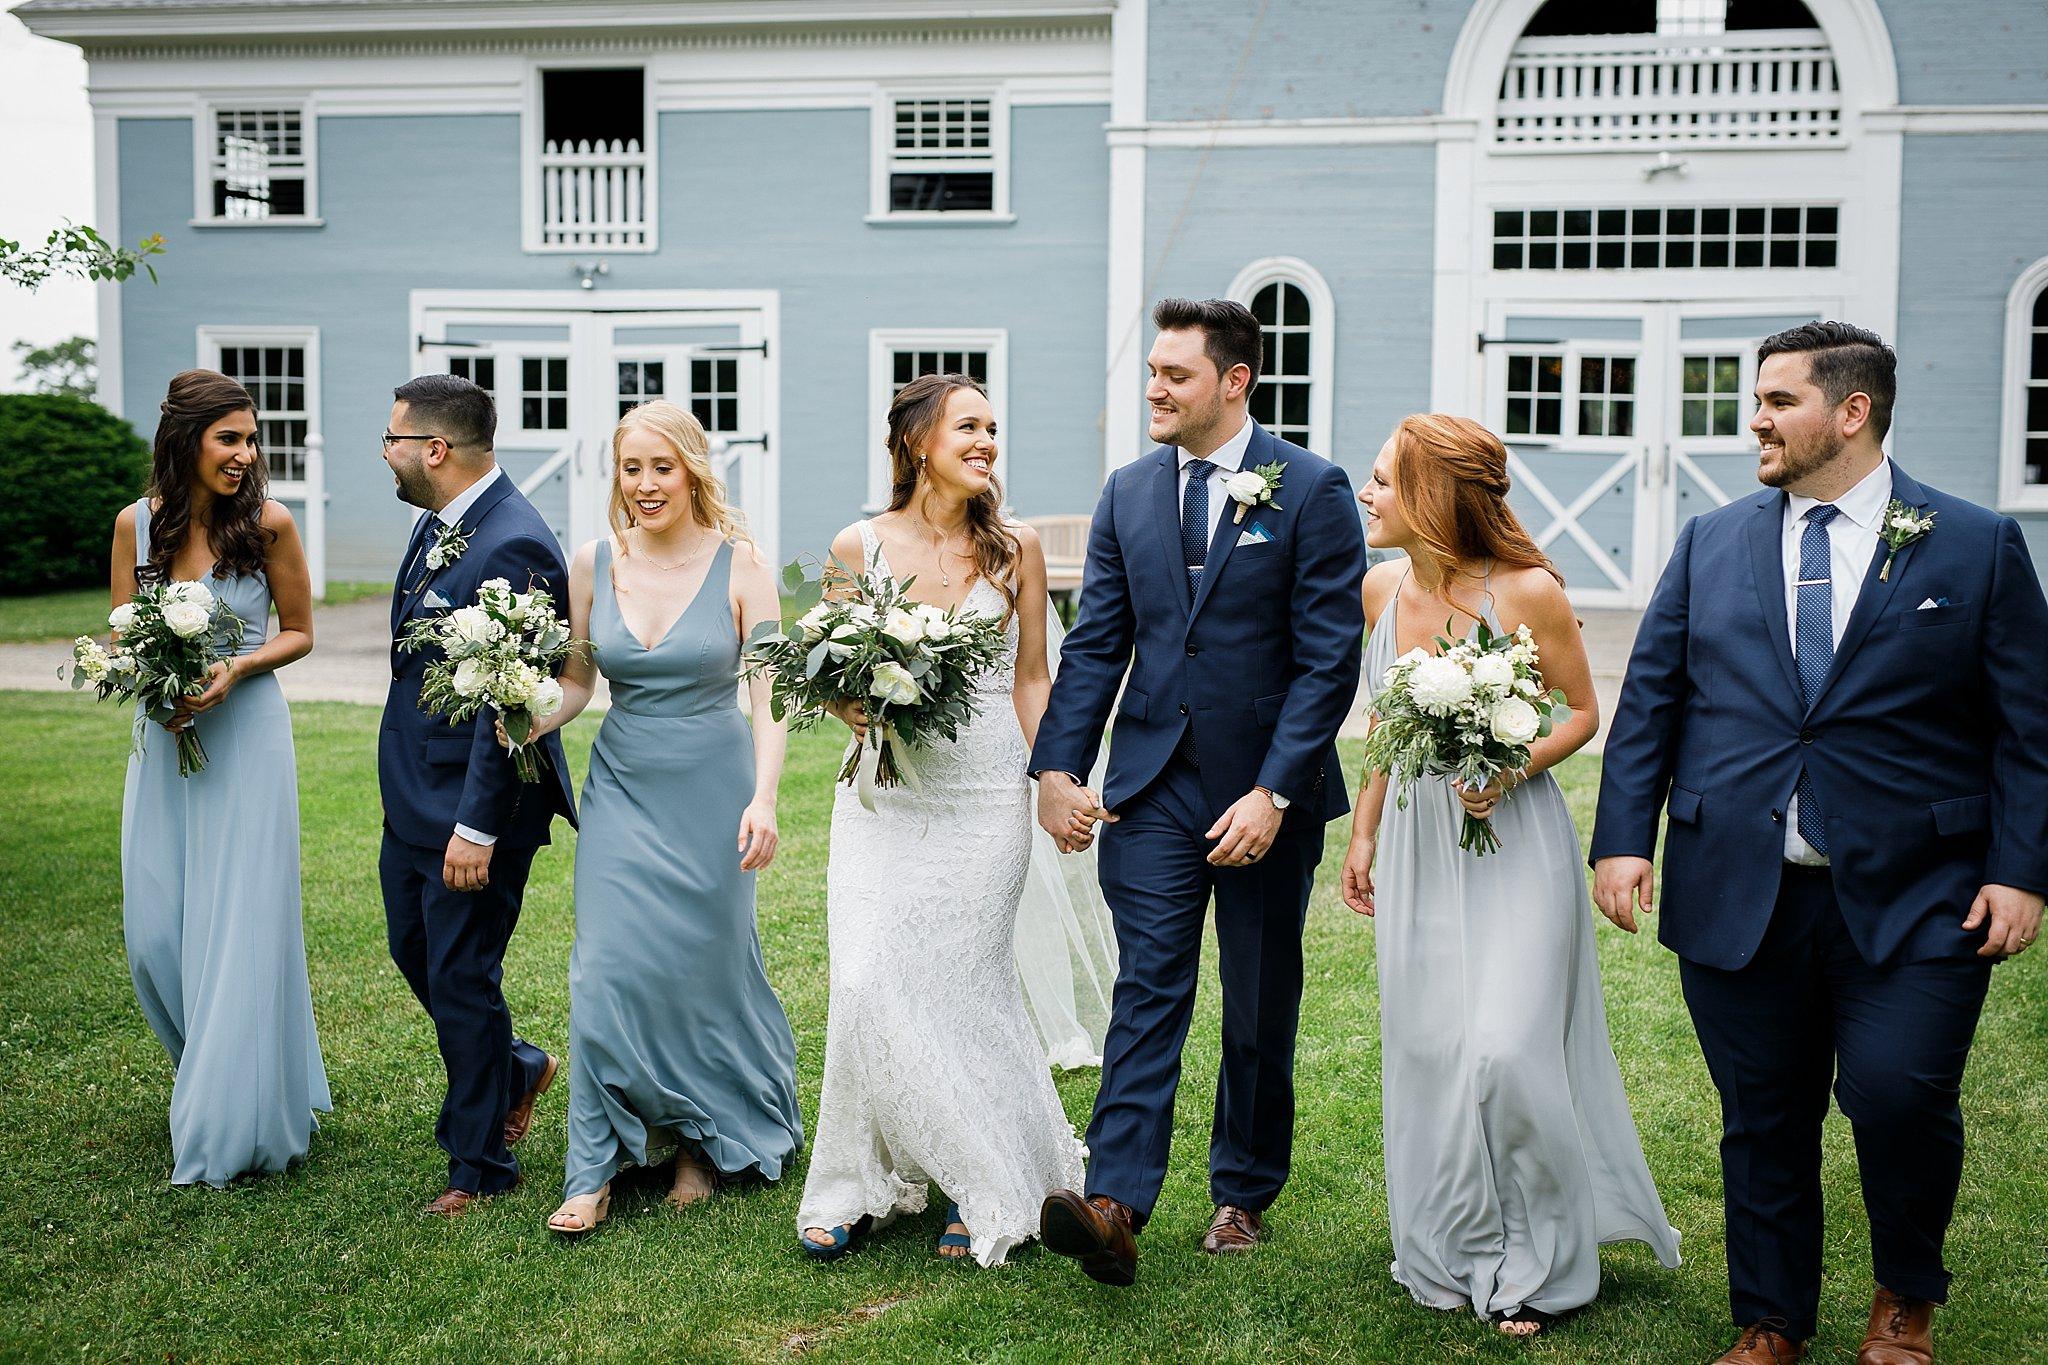 Hudson Valley Weddings at the Hill Hudson New York Wedding Photographer60.jpg